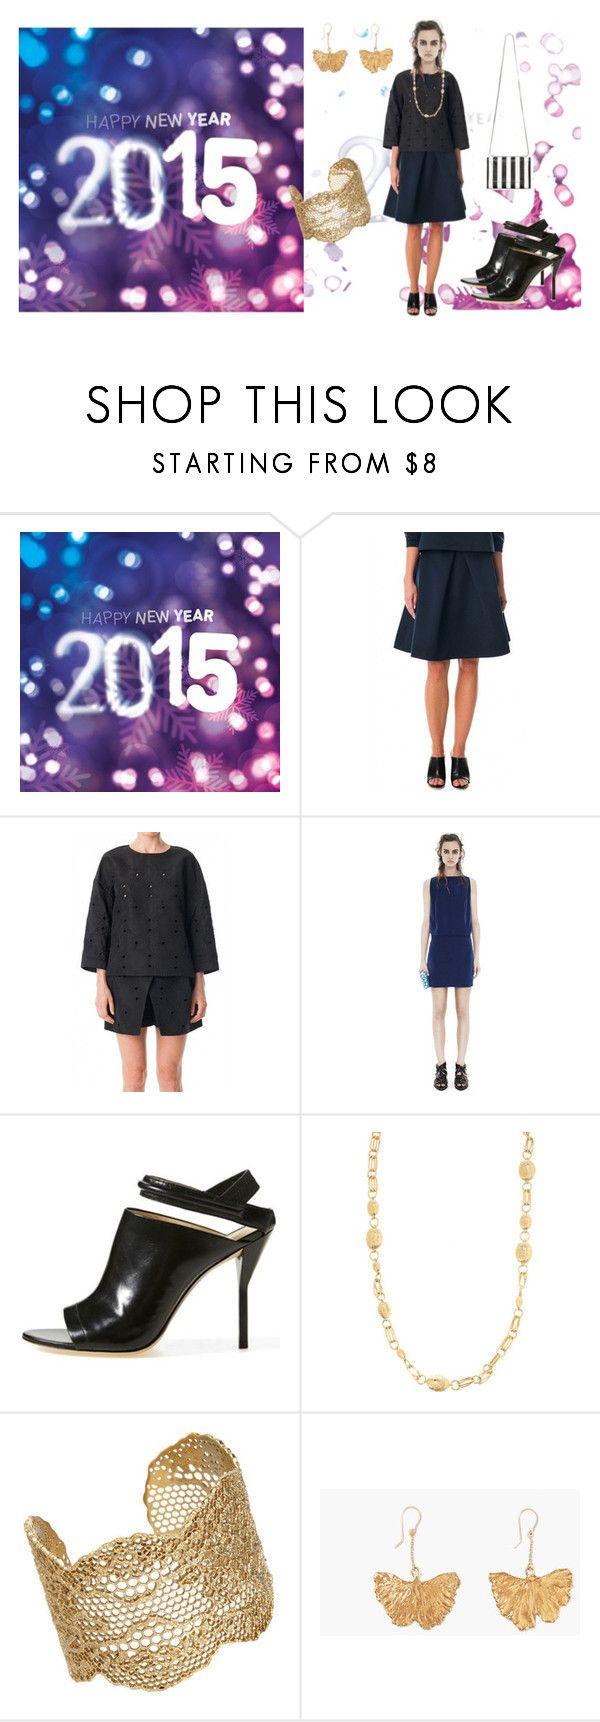 """GOODBYE 2014 - HELLO 2015!"" by gordon-stuart ❤ liked on Polyvore featuring TIBI, Acne Studios, 3.1 Phillip Lim and Aurélie Bidermann"